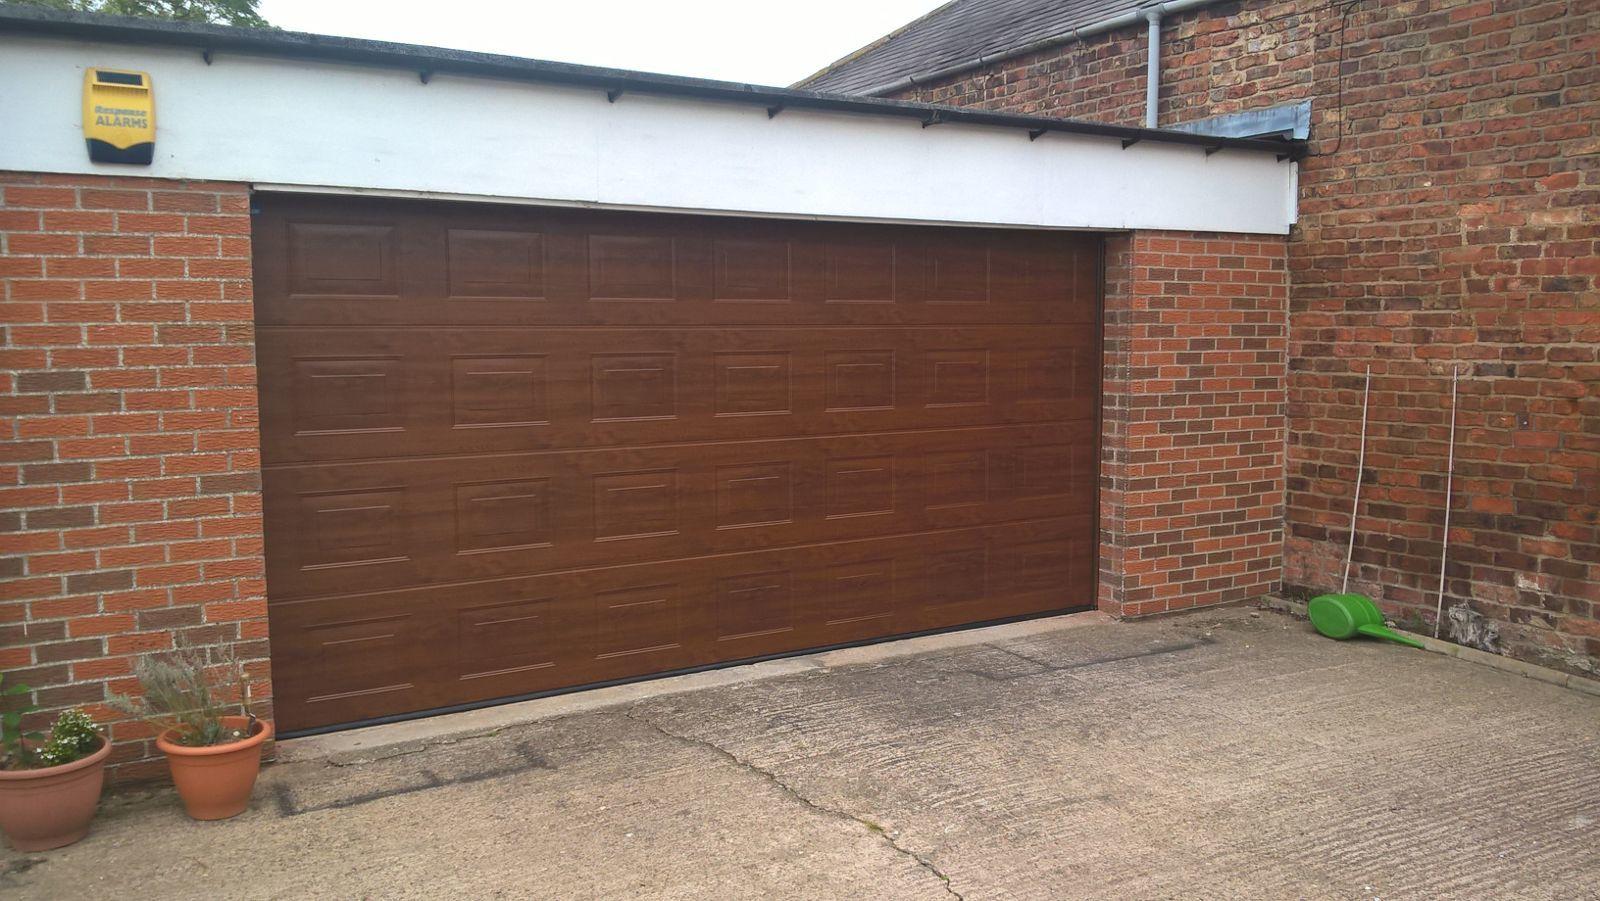 Georgian Insulated Sectional Garage Door, Sheffield